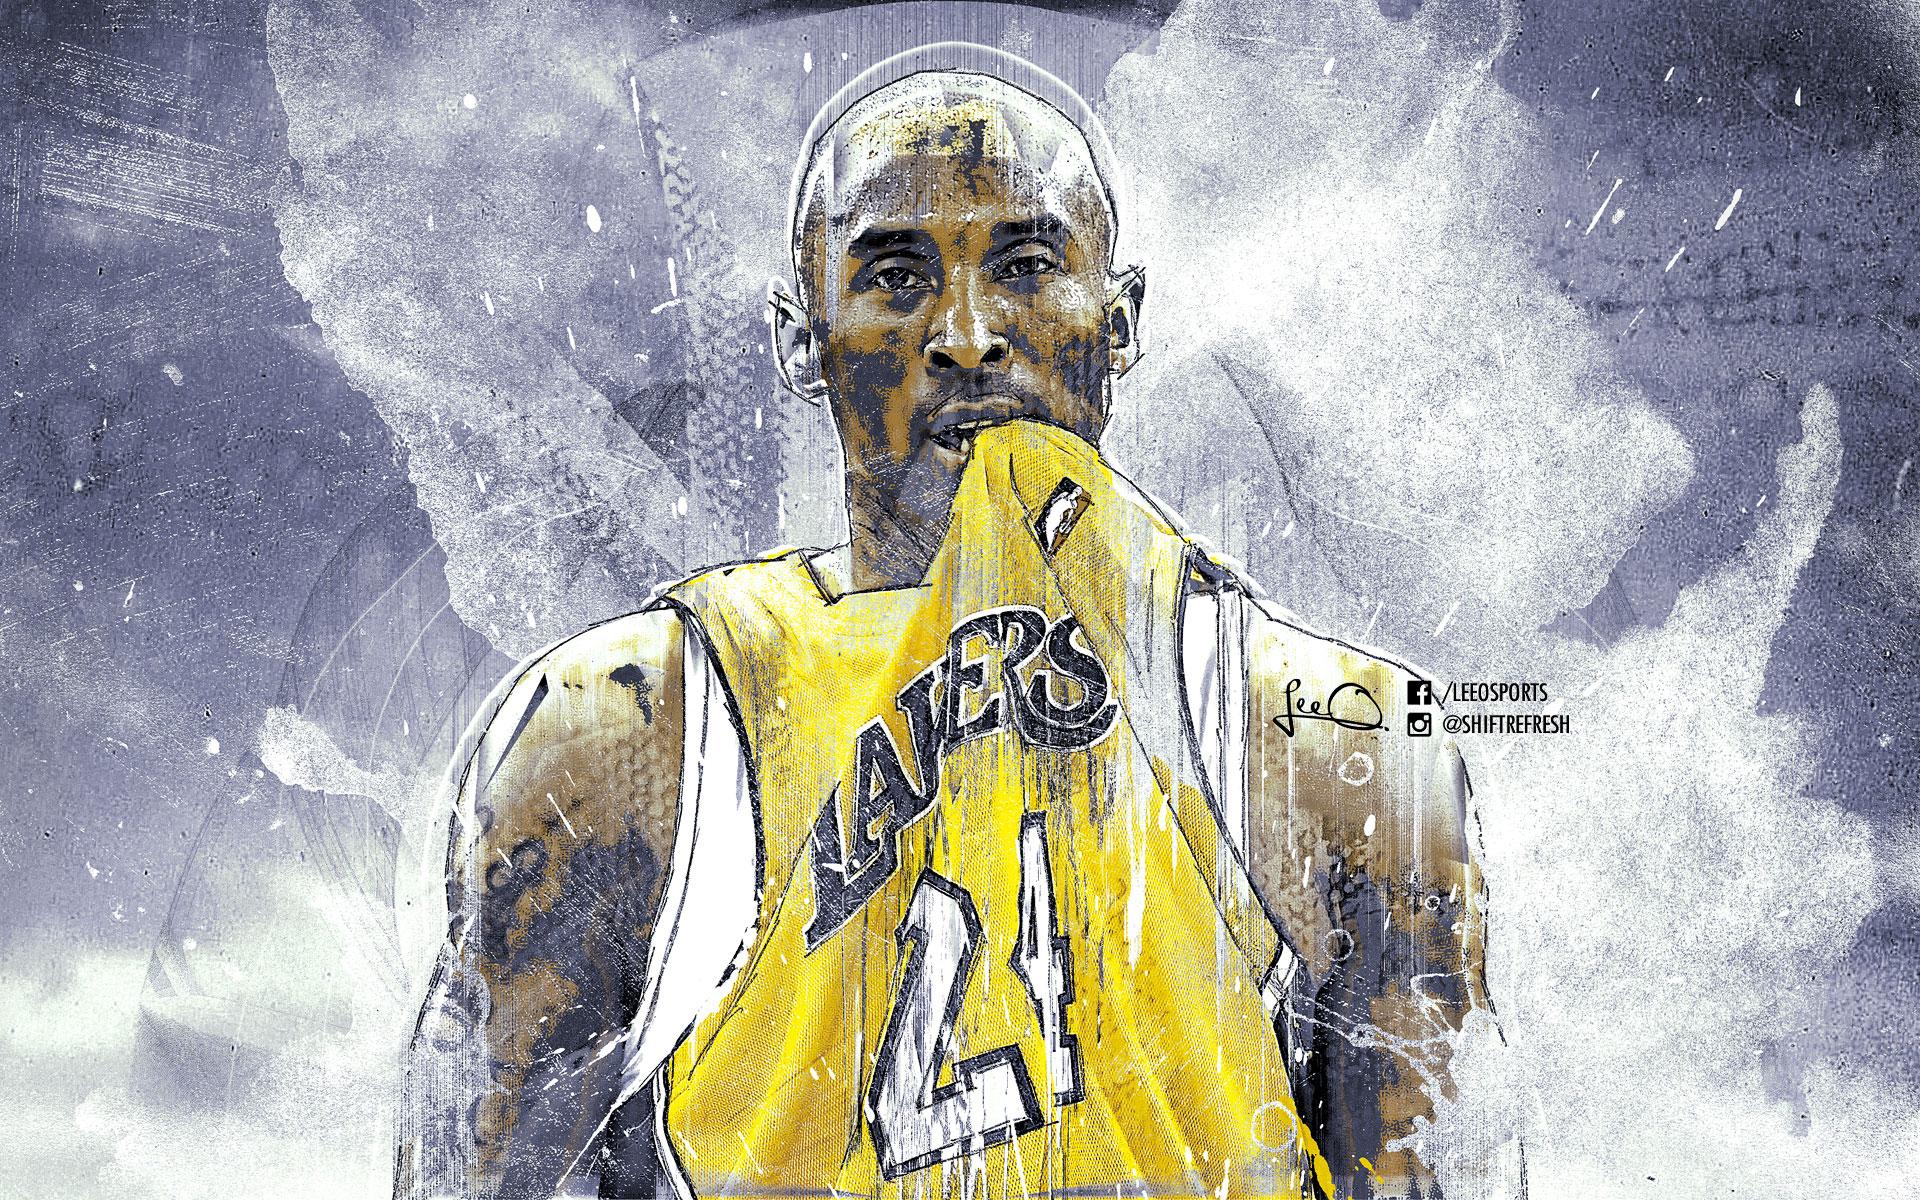 Los Angeles Lakers Wallpaper Hd Kobe Bryant Backgrounds Collection Pixelstalk Net